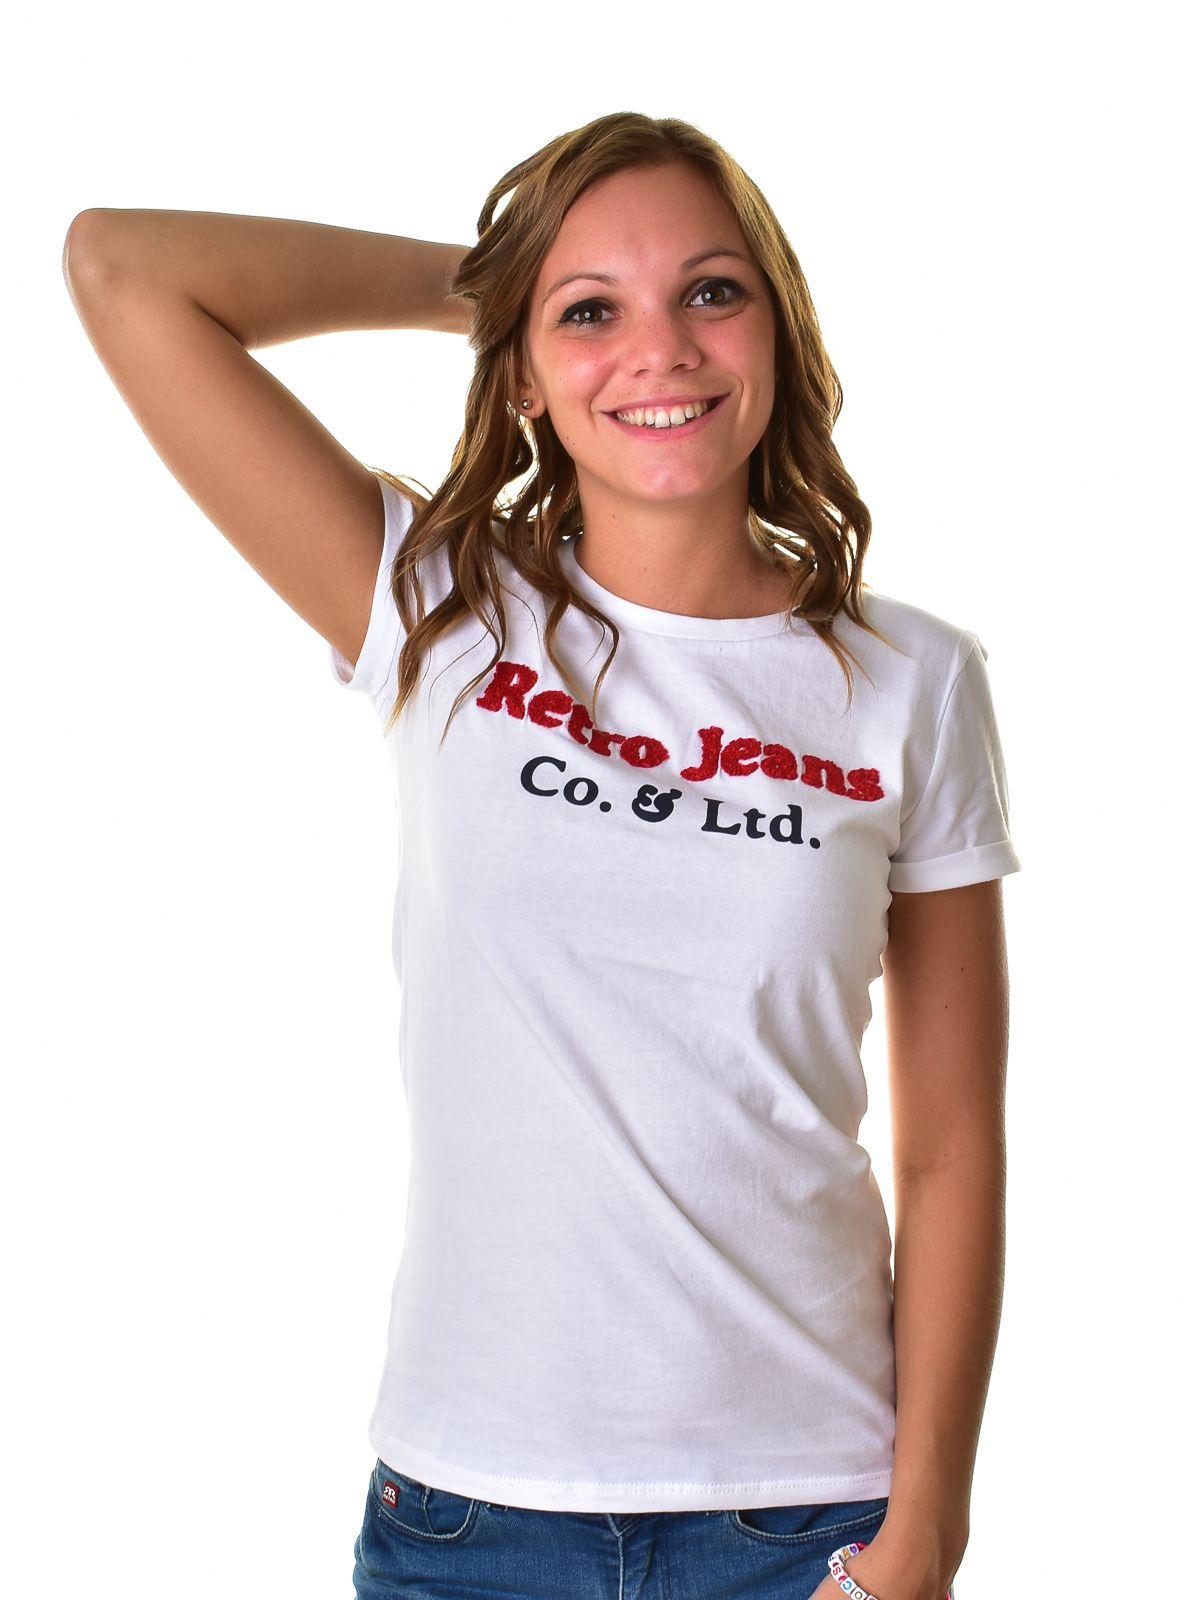 cf1fd01554 Retro Jeans női póló ISABEL T-SHIRT | Markasbolt.hu Hivatalos RETRO ...